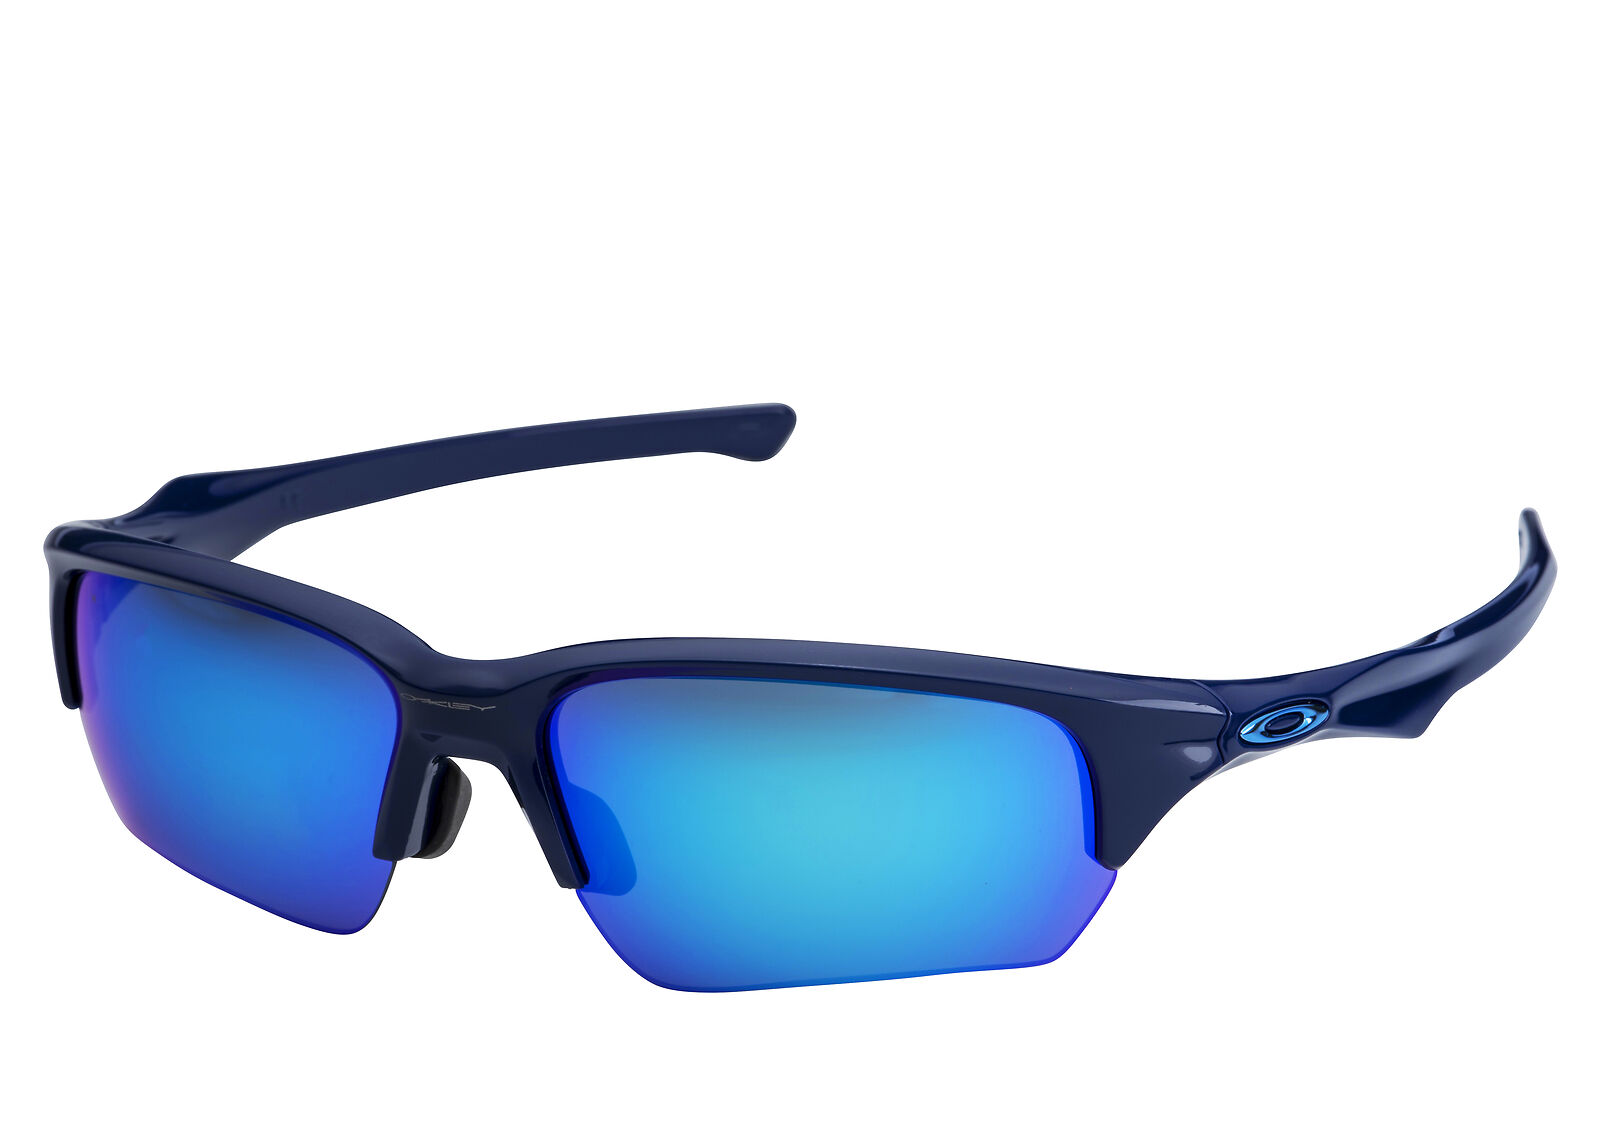 94bfc2c75 Details about Oakley Flak Beta OO9372-03 Navy Sapphire Iridium Sunglasses  Asian Fit 9372